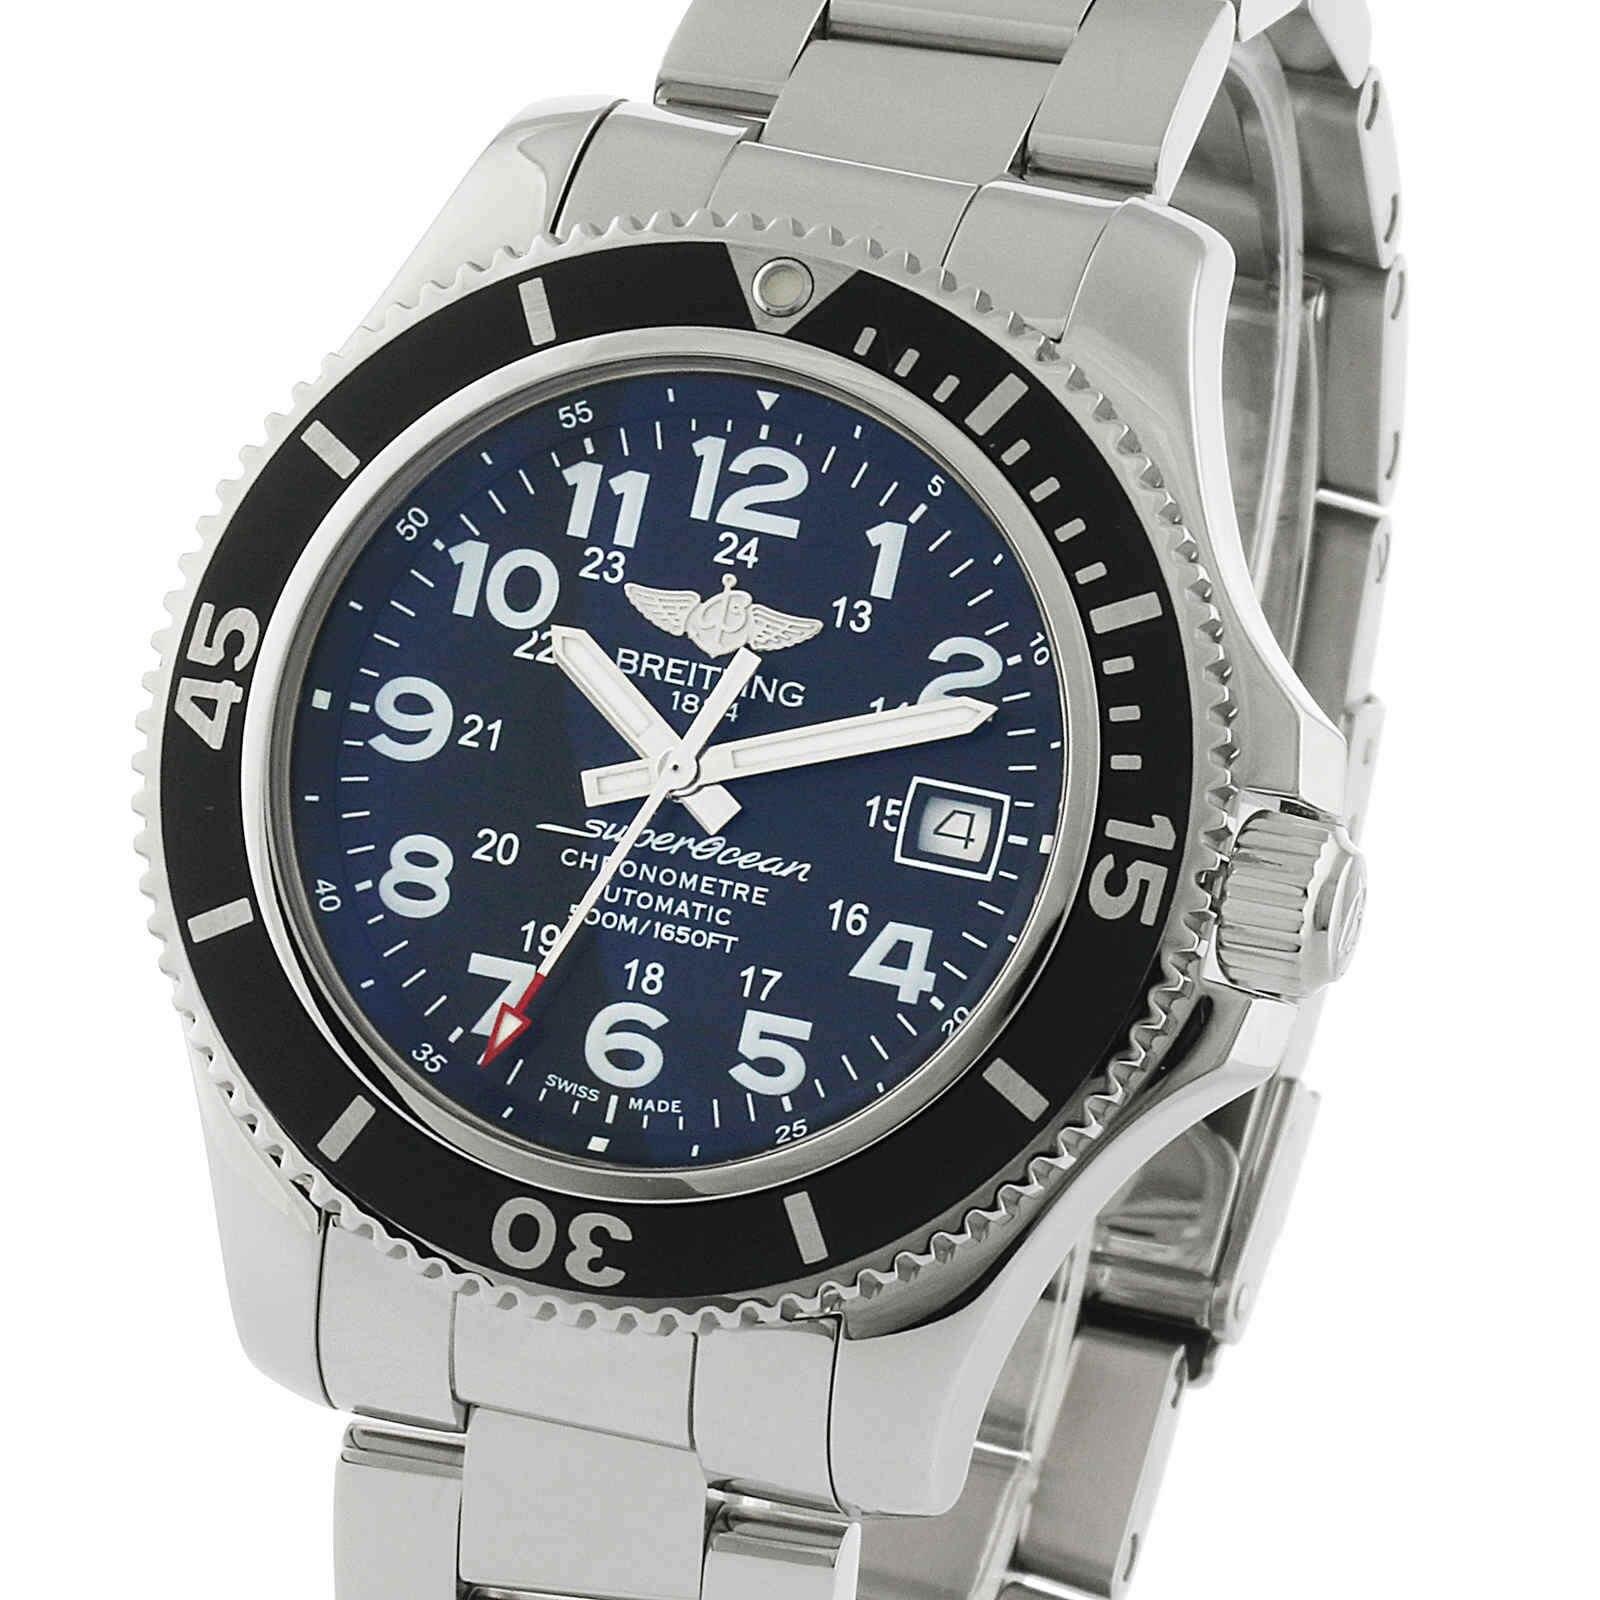 Breitling Superocean II Mens Watch